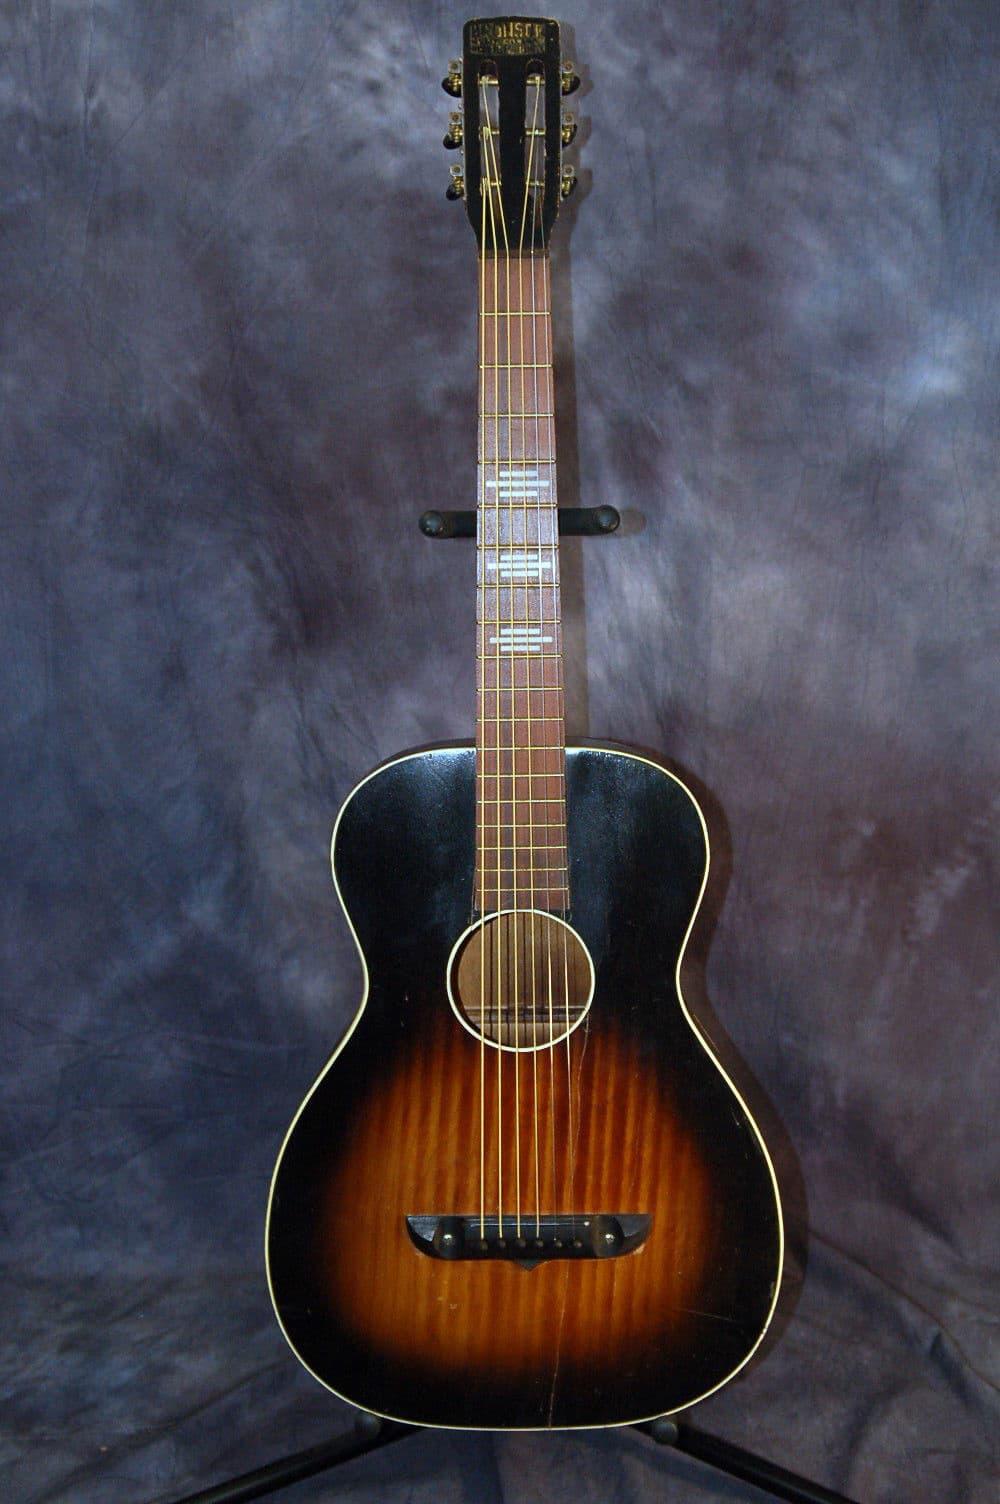 Vintage Rare 1950 S Bronson Square Neck Slide Blues Guitar